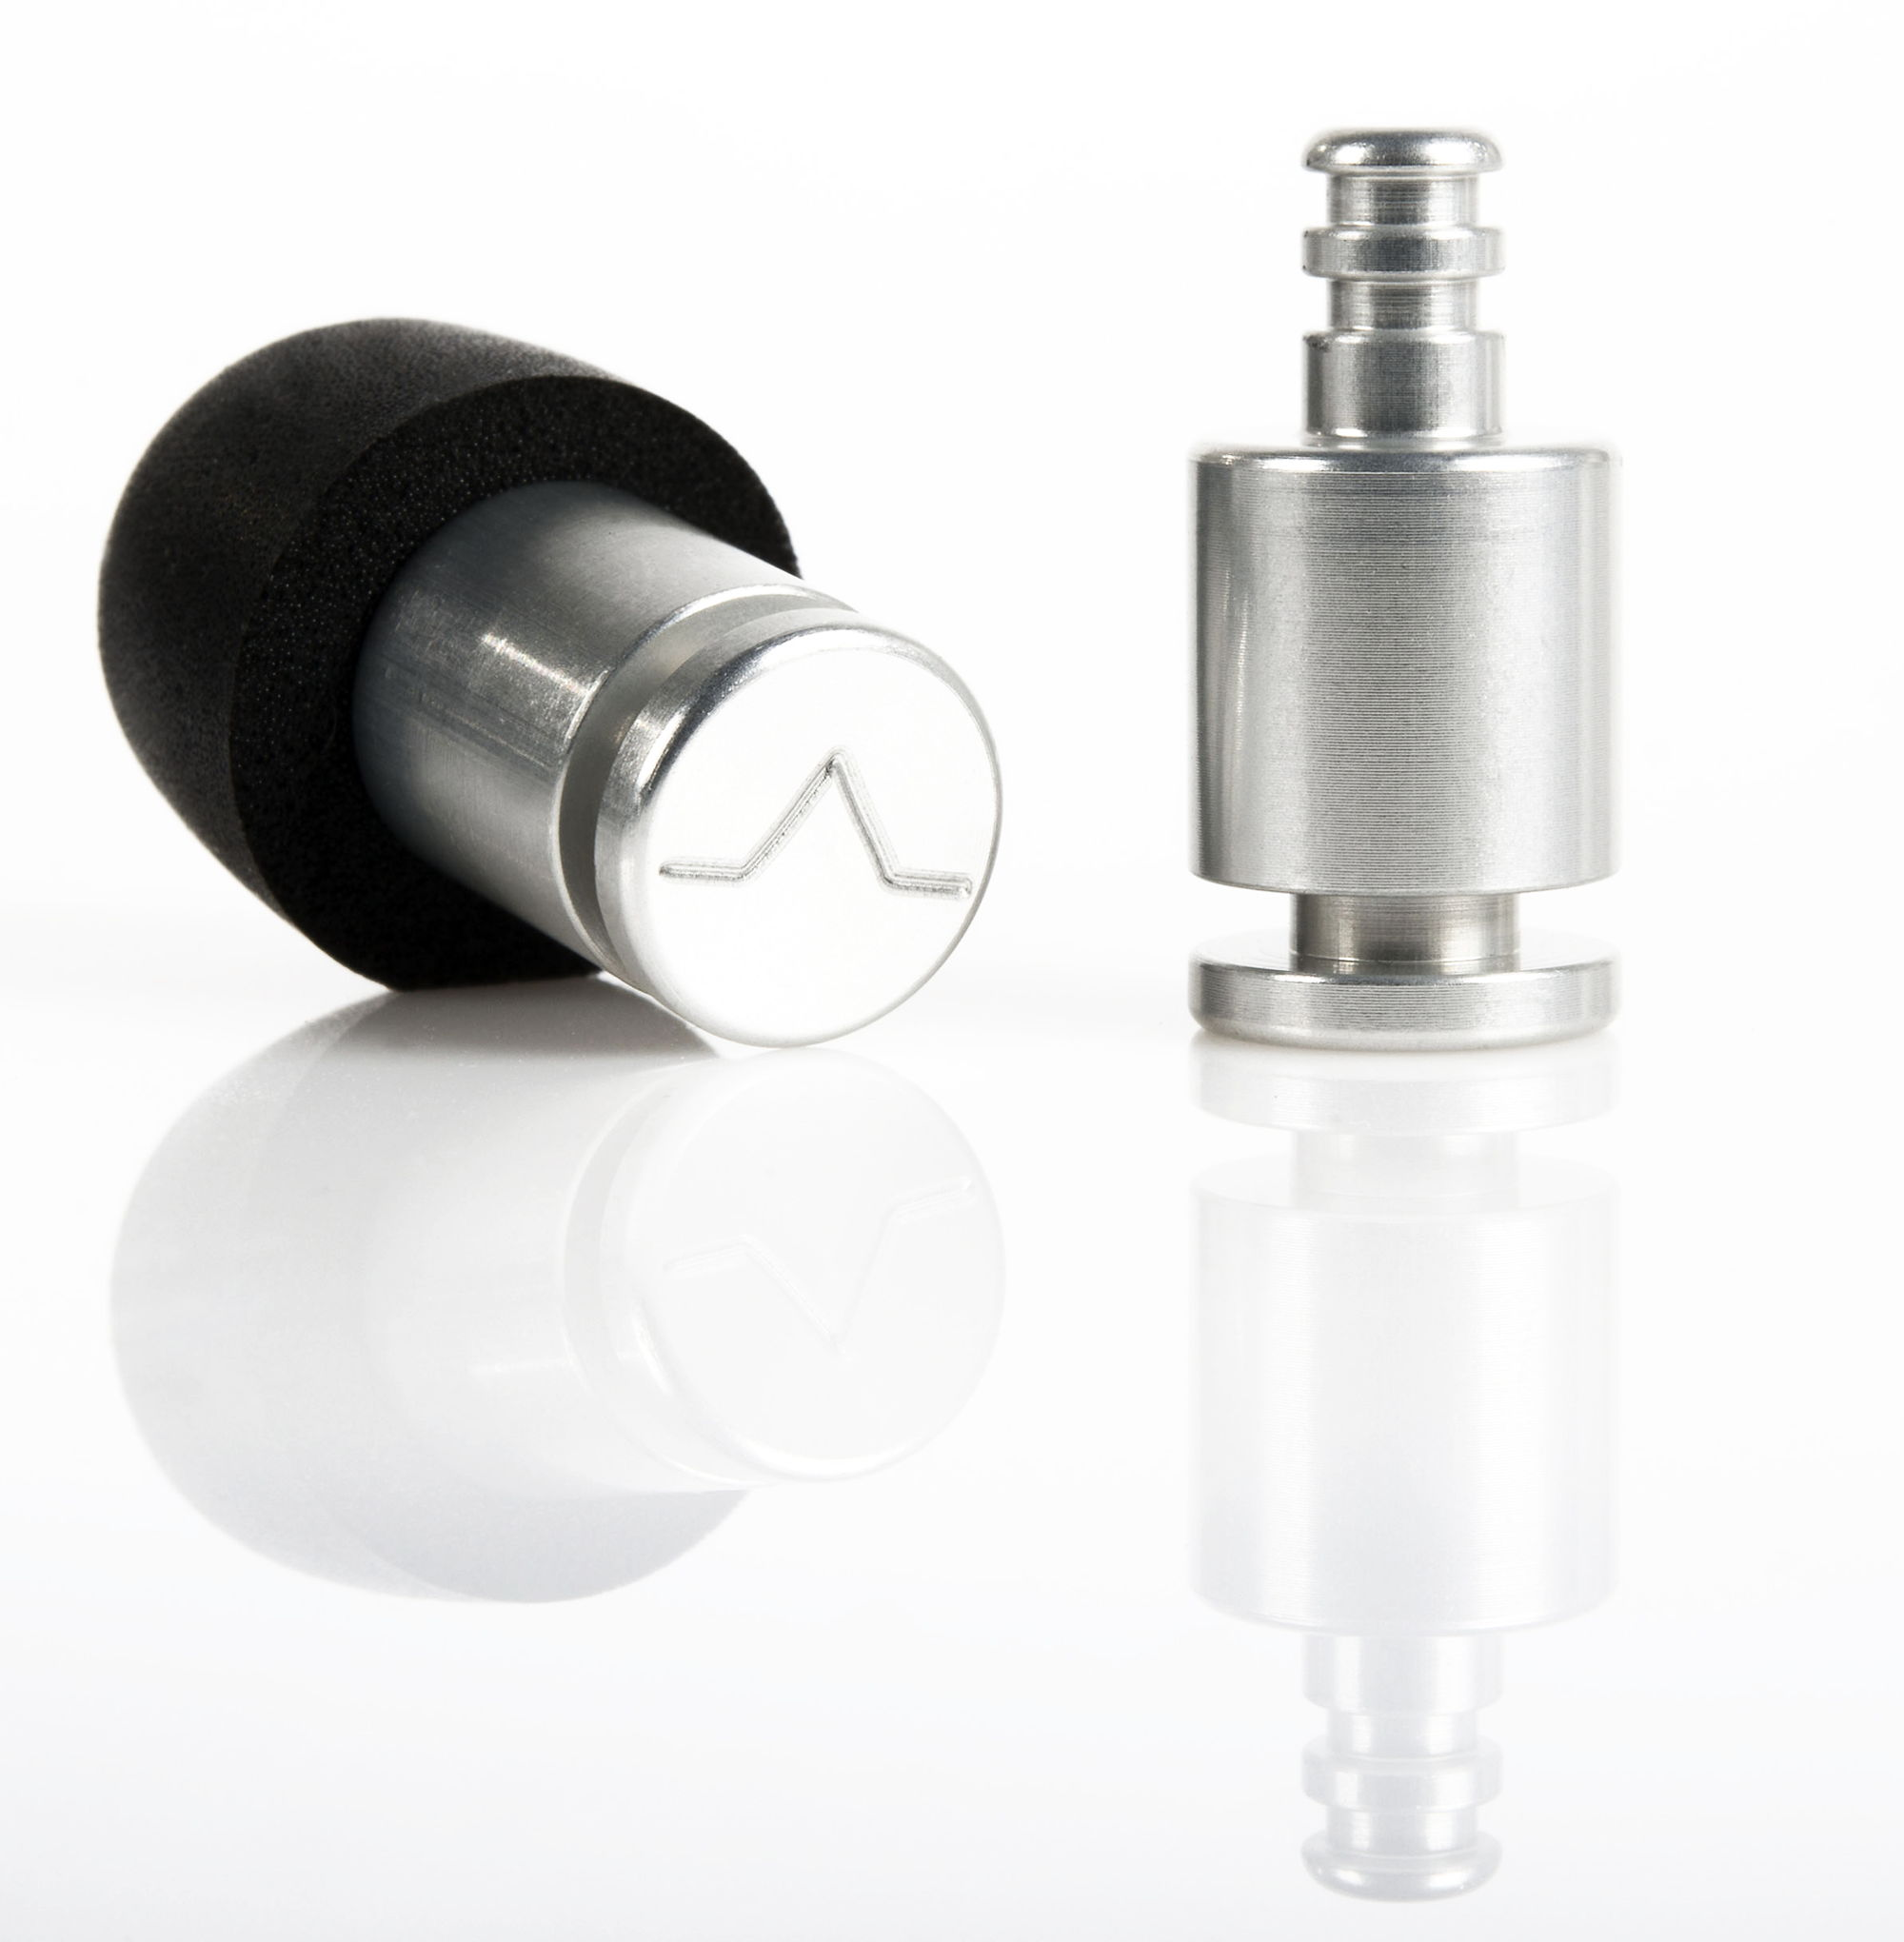 Isolate Ear Plugs